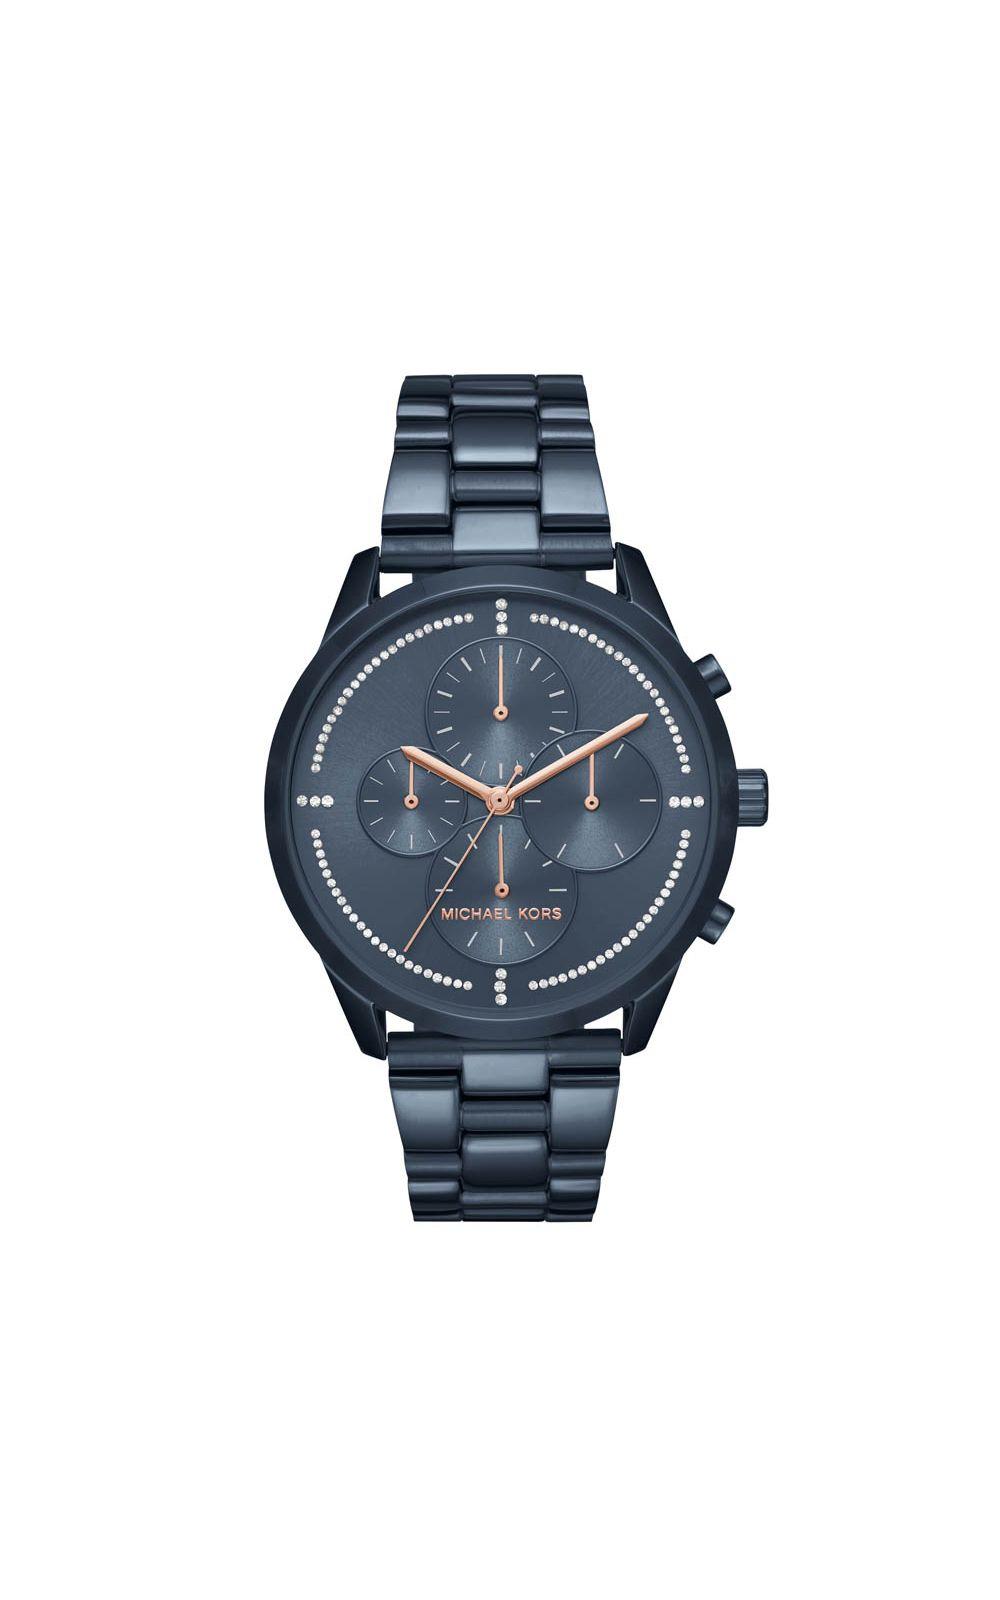 600597fdc6051 Relógio Michael Kors Feminino Azul Slater - MK6522 4AN. undefined